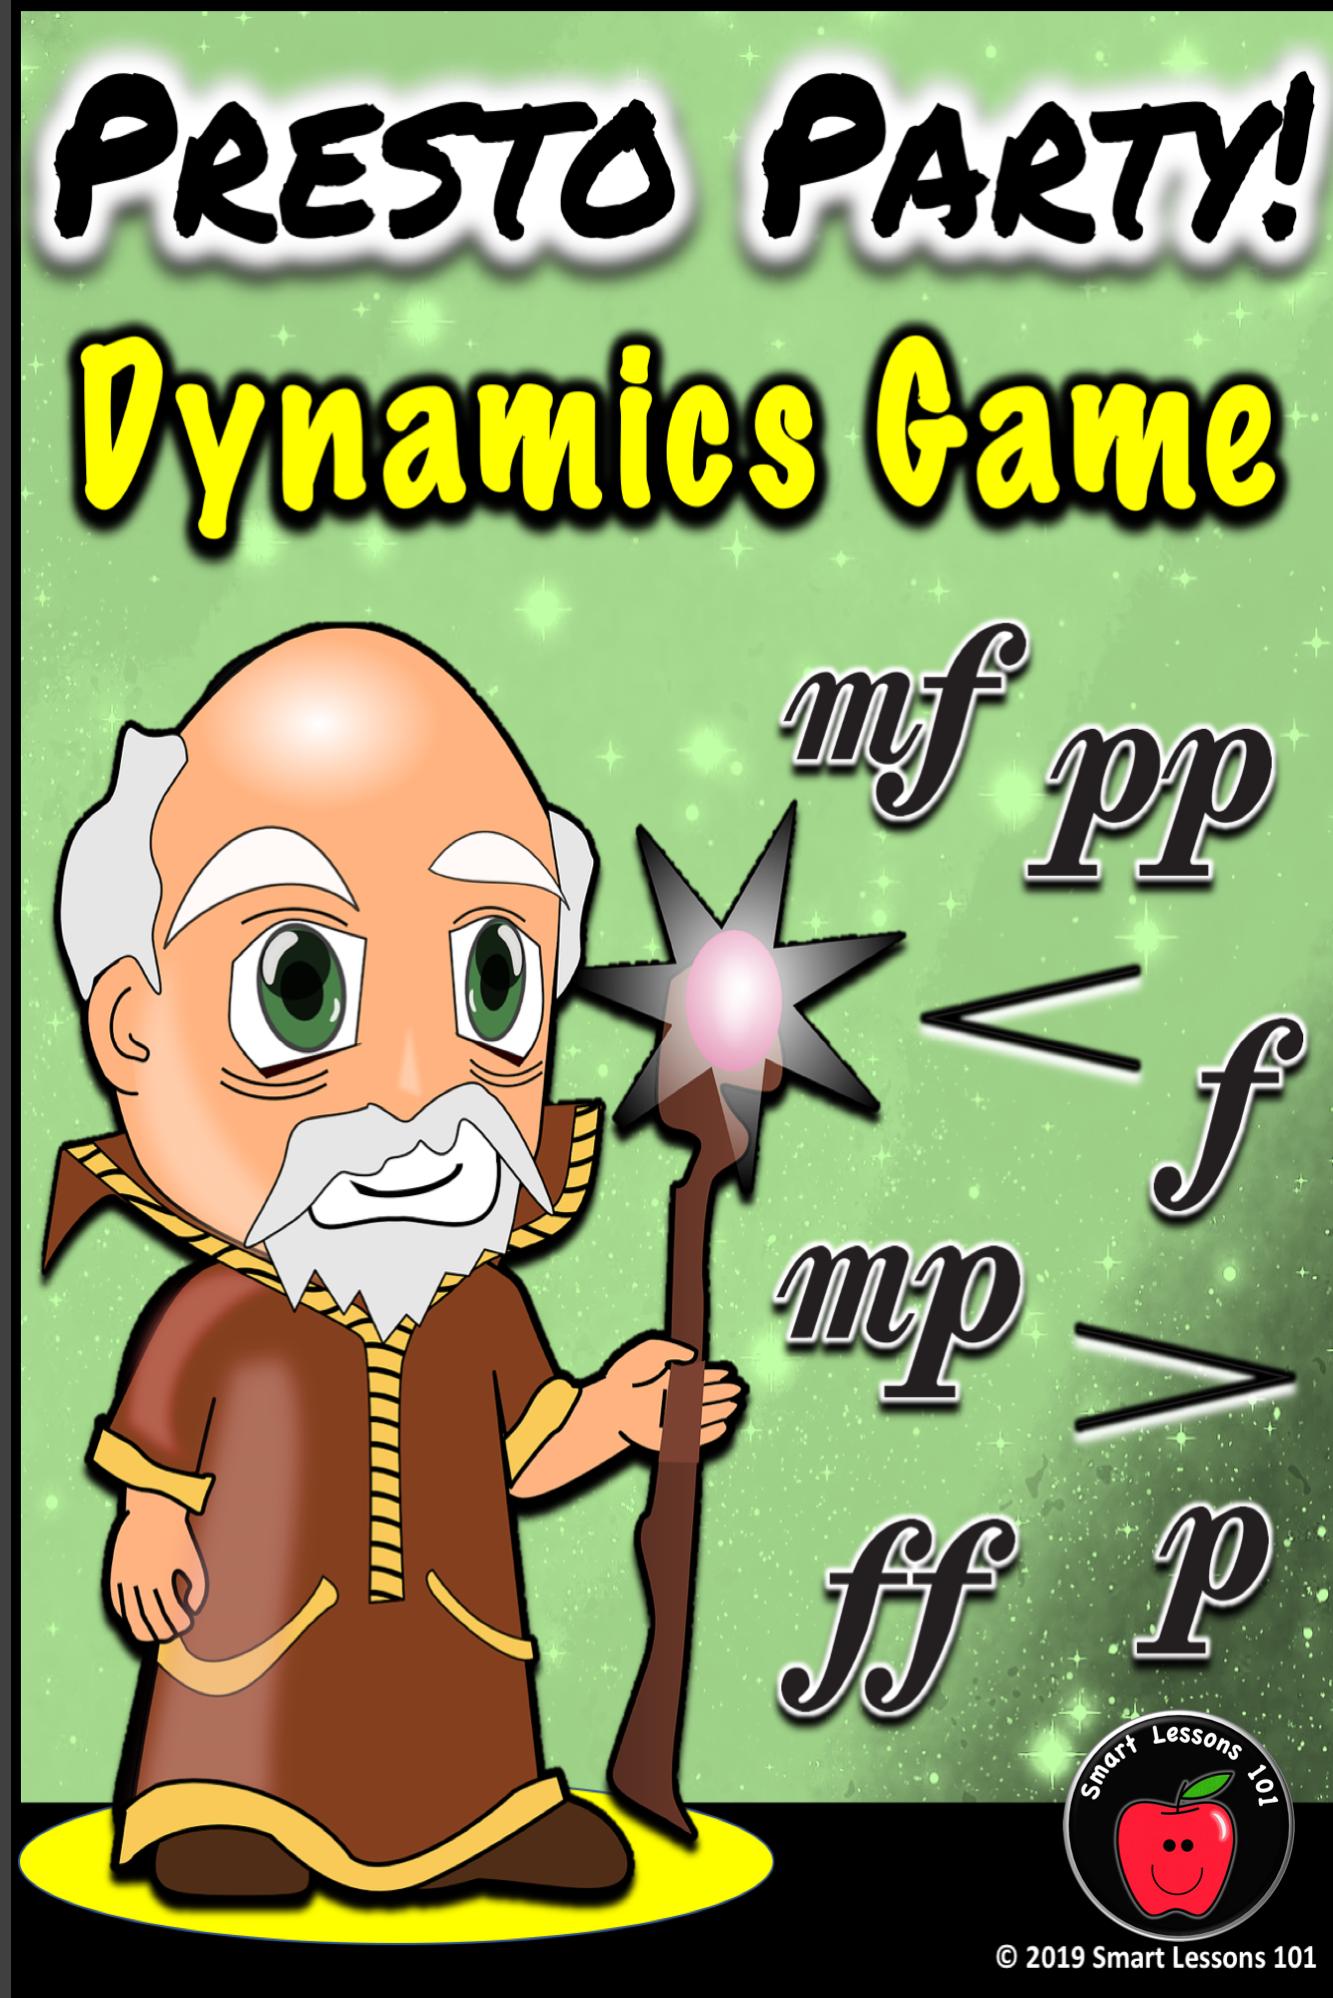 Music Dynamics Game Fun Presto Party Dynamics Music Game